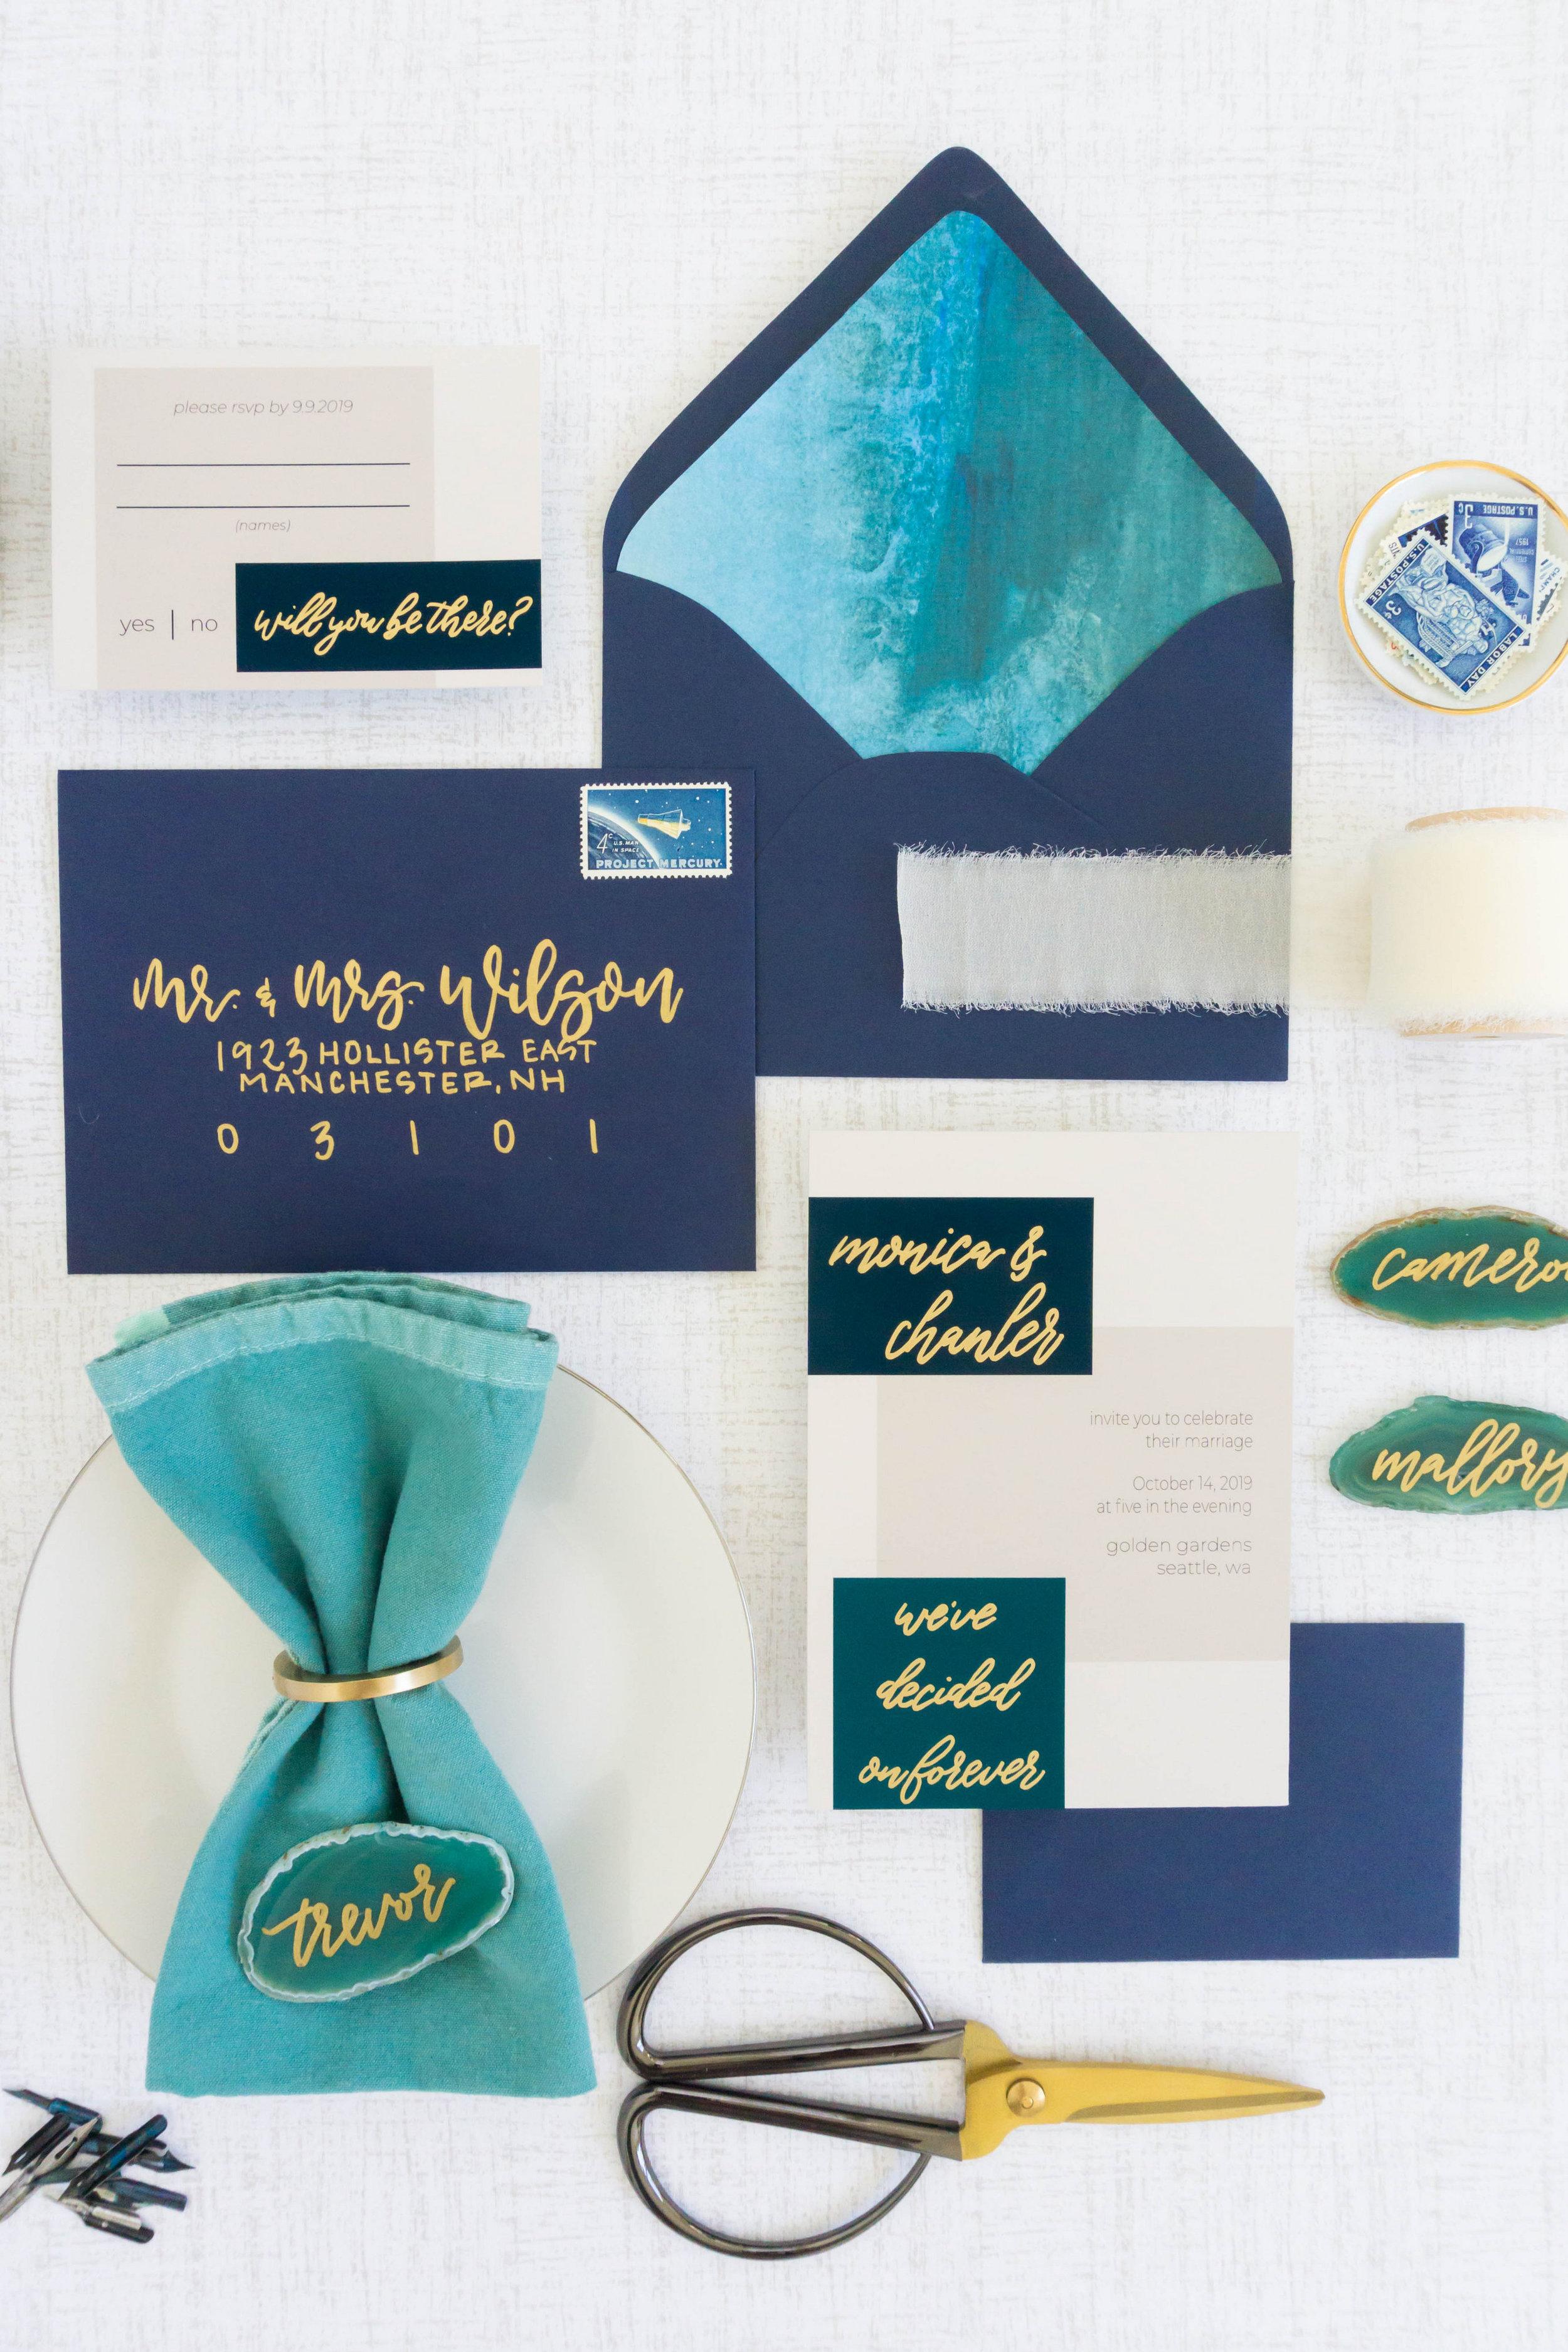 love-fern-design-studio-custom-wedding-invitations-for-the-modern-couple-modern-calligraphy-in-seattle-washington-custom-wedding-stationery-navy-gold-teal-modern-color-block